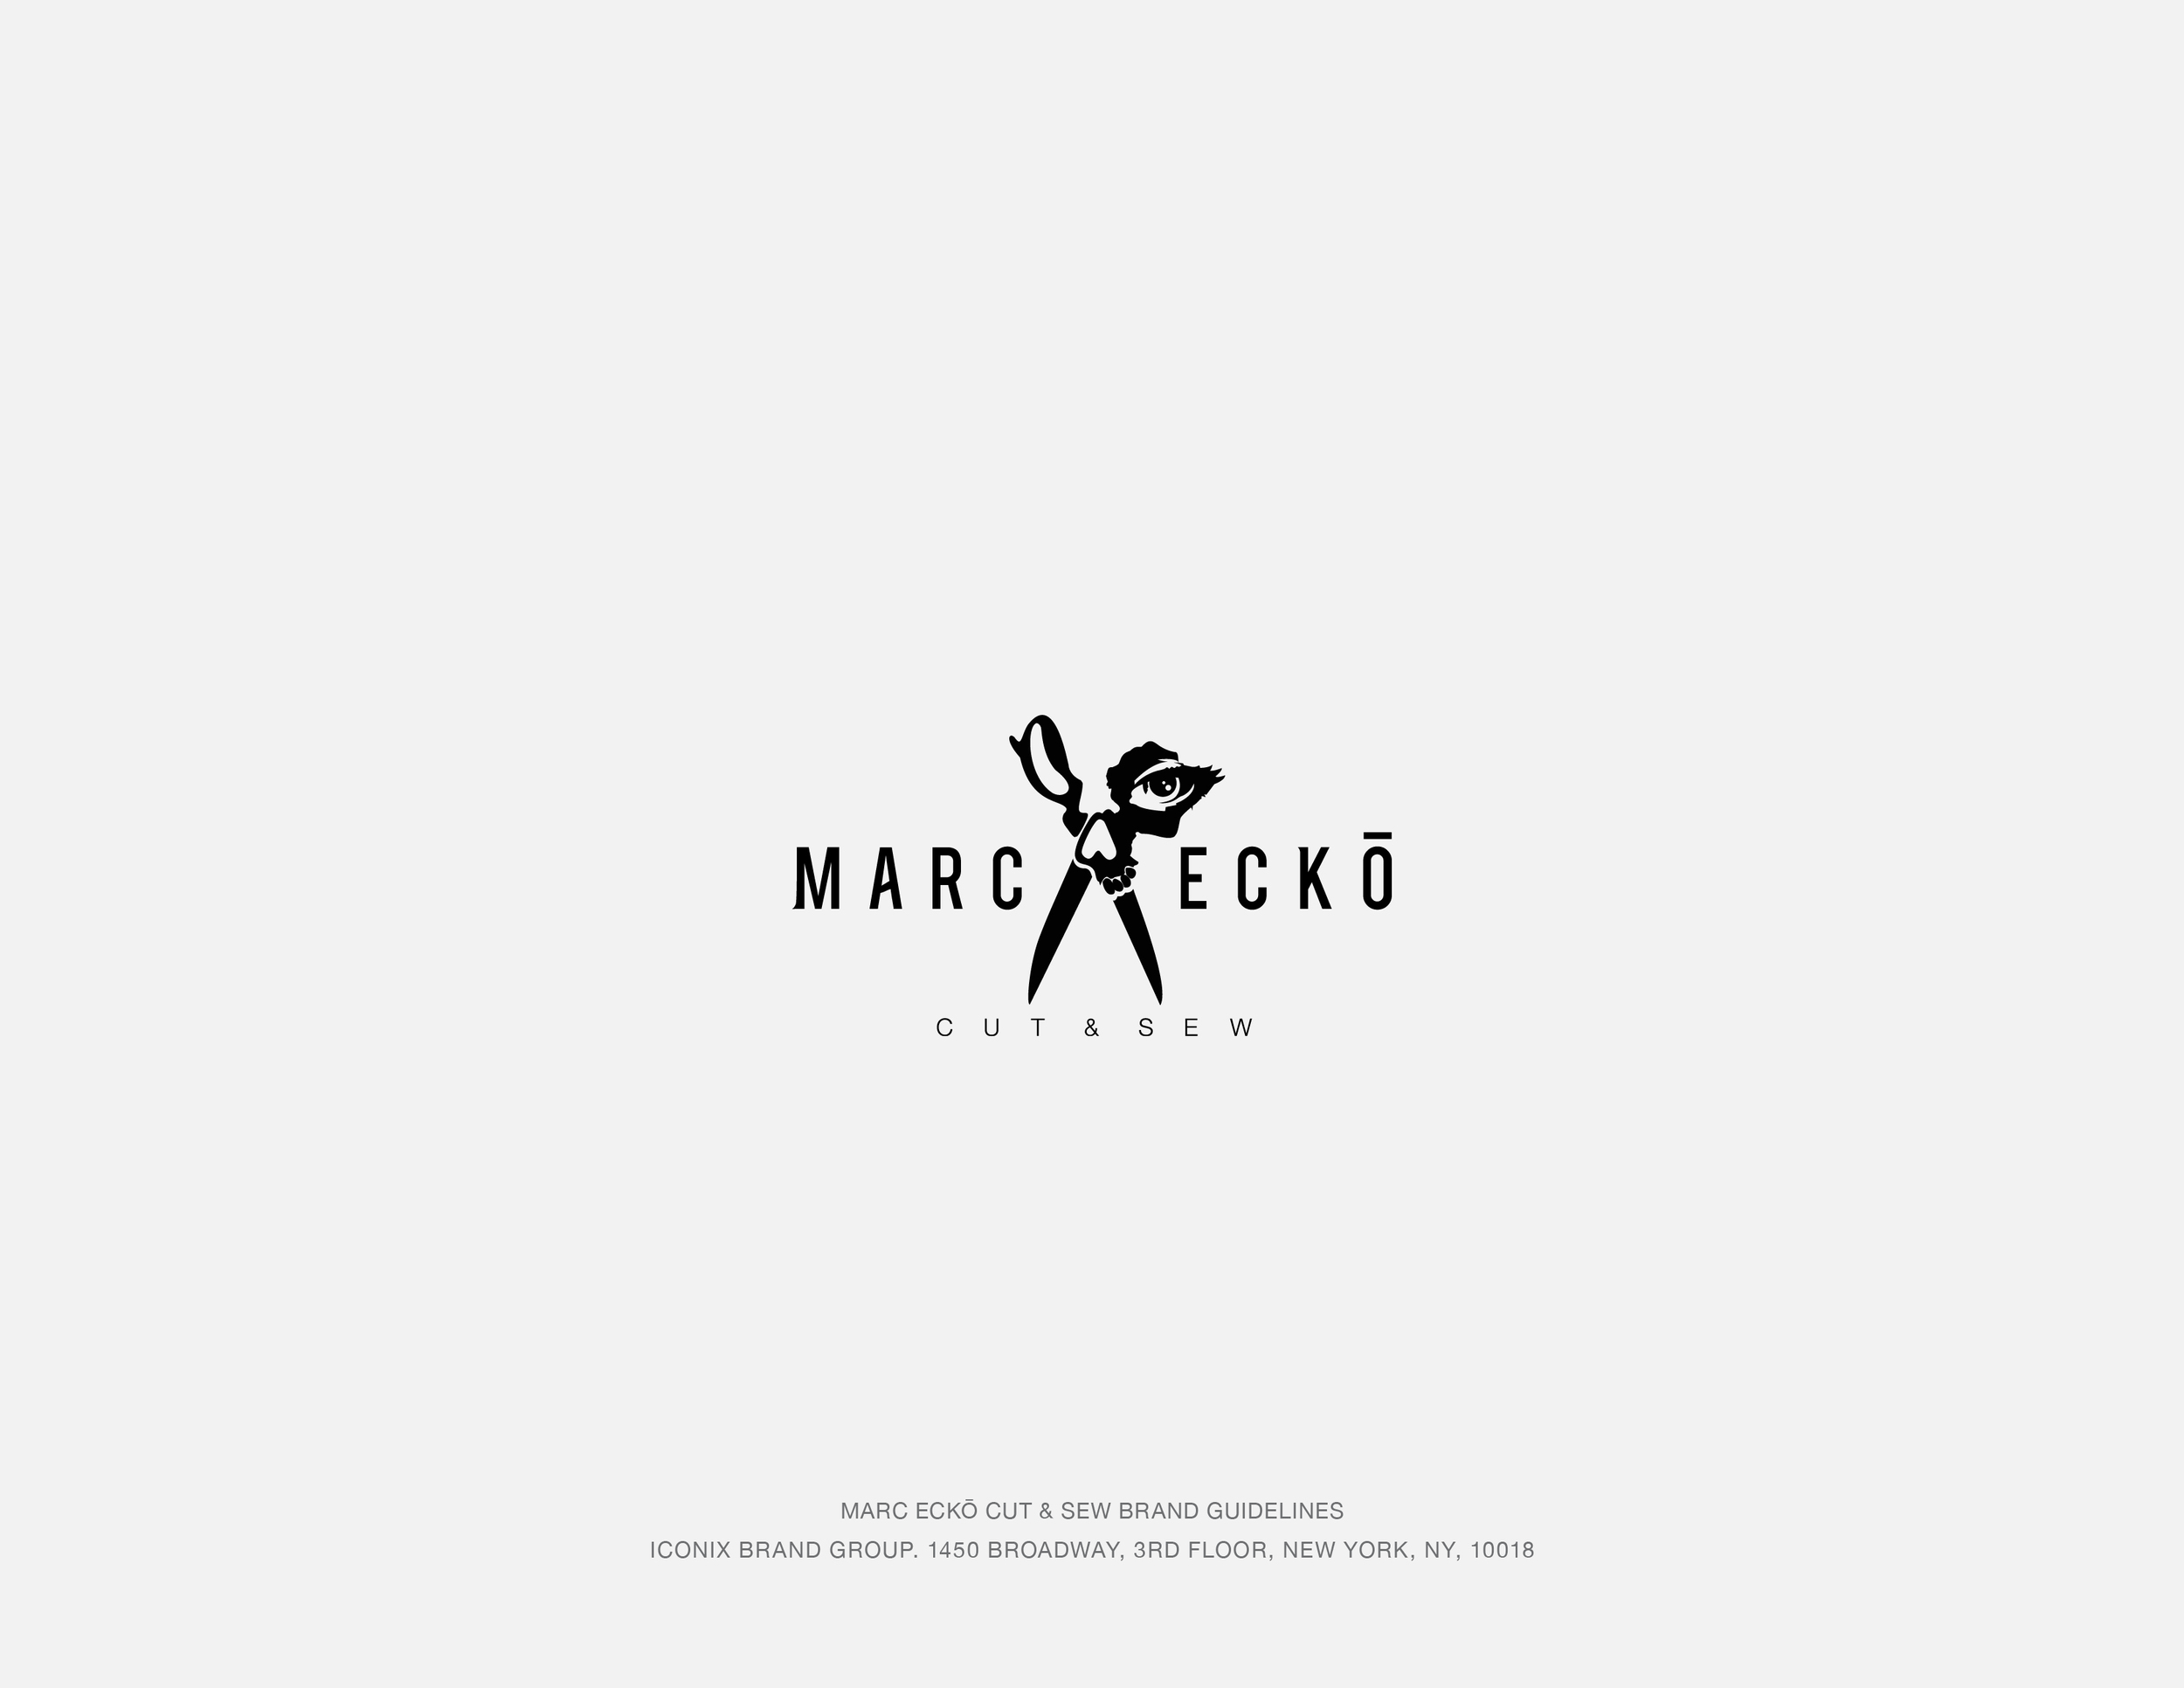 Marc-Ecko-brand-guidelines13.jpg